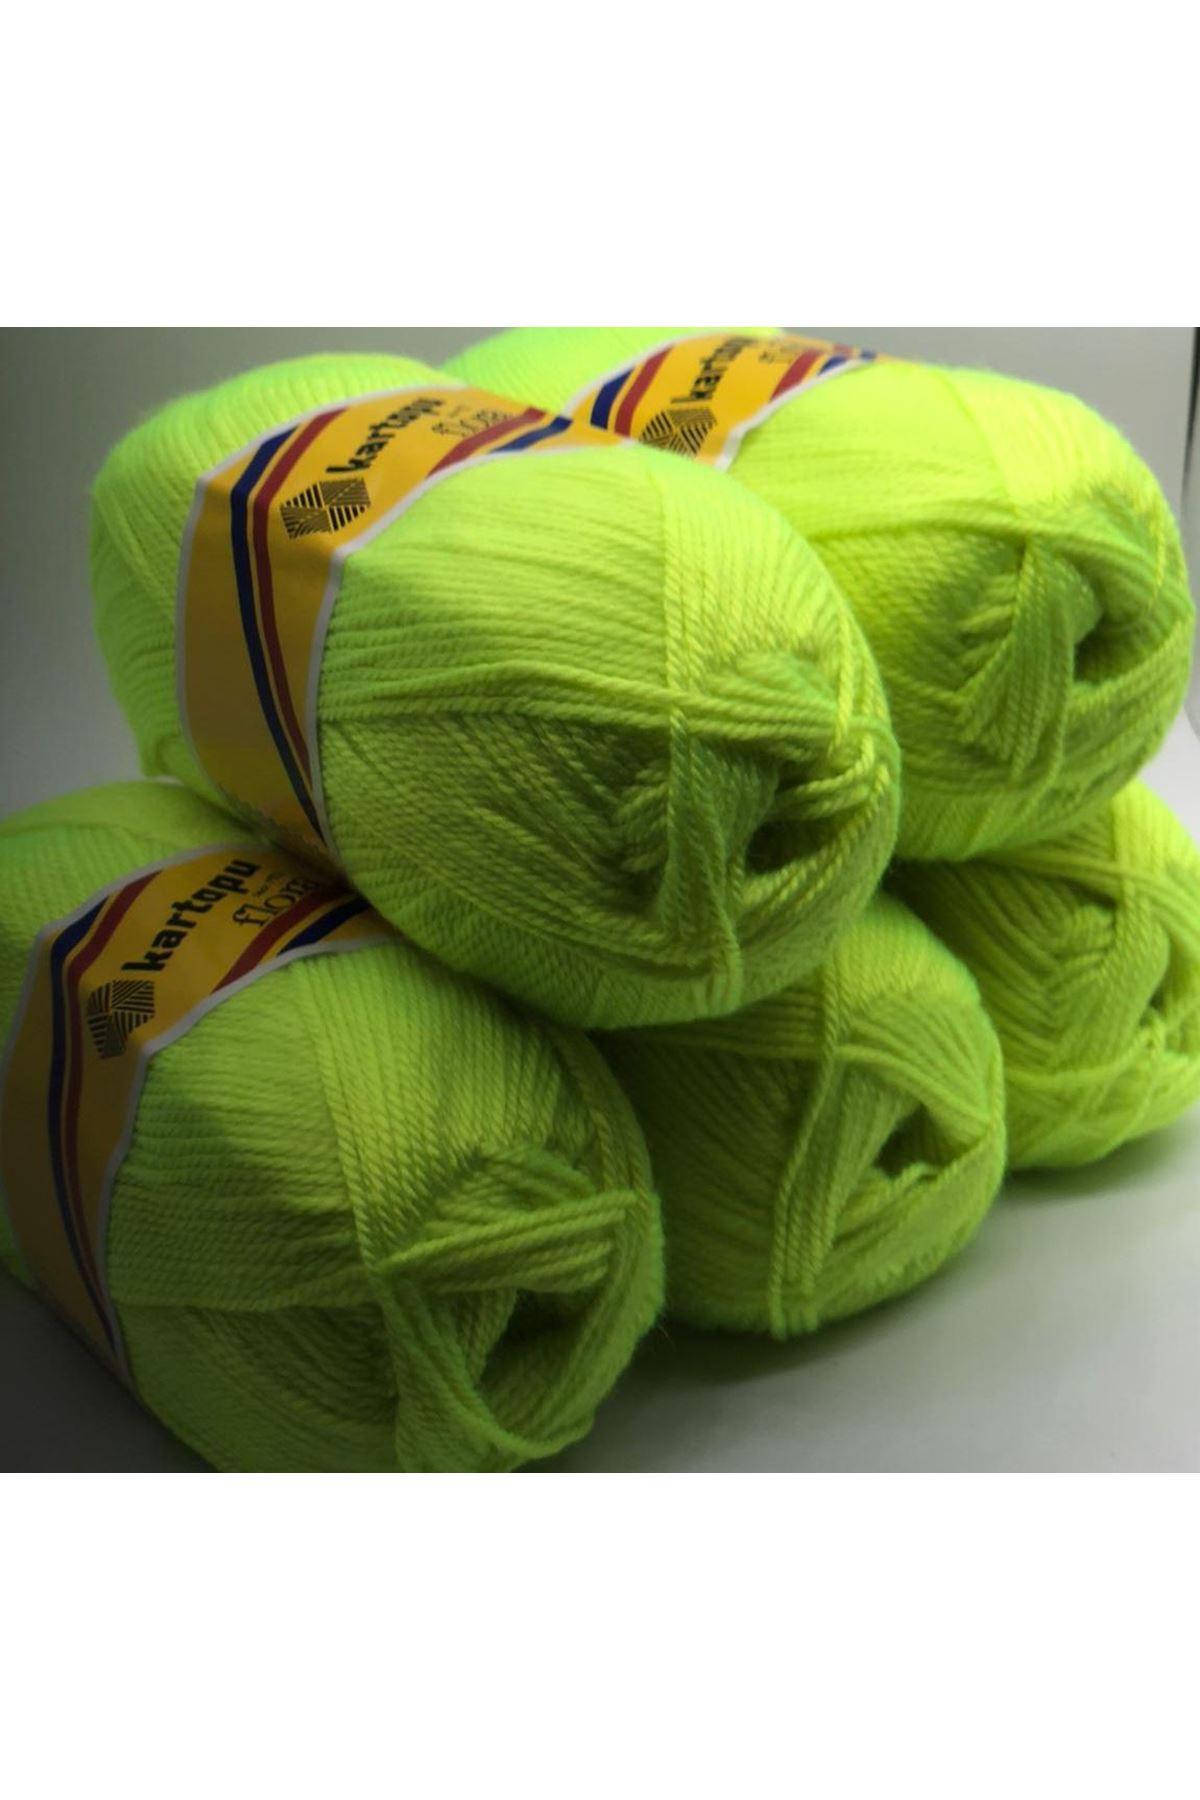 KARTOPU FLORA 5li paket K448 Açık Neon Yeşil Ex-895